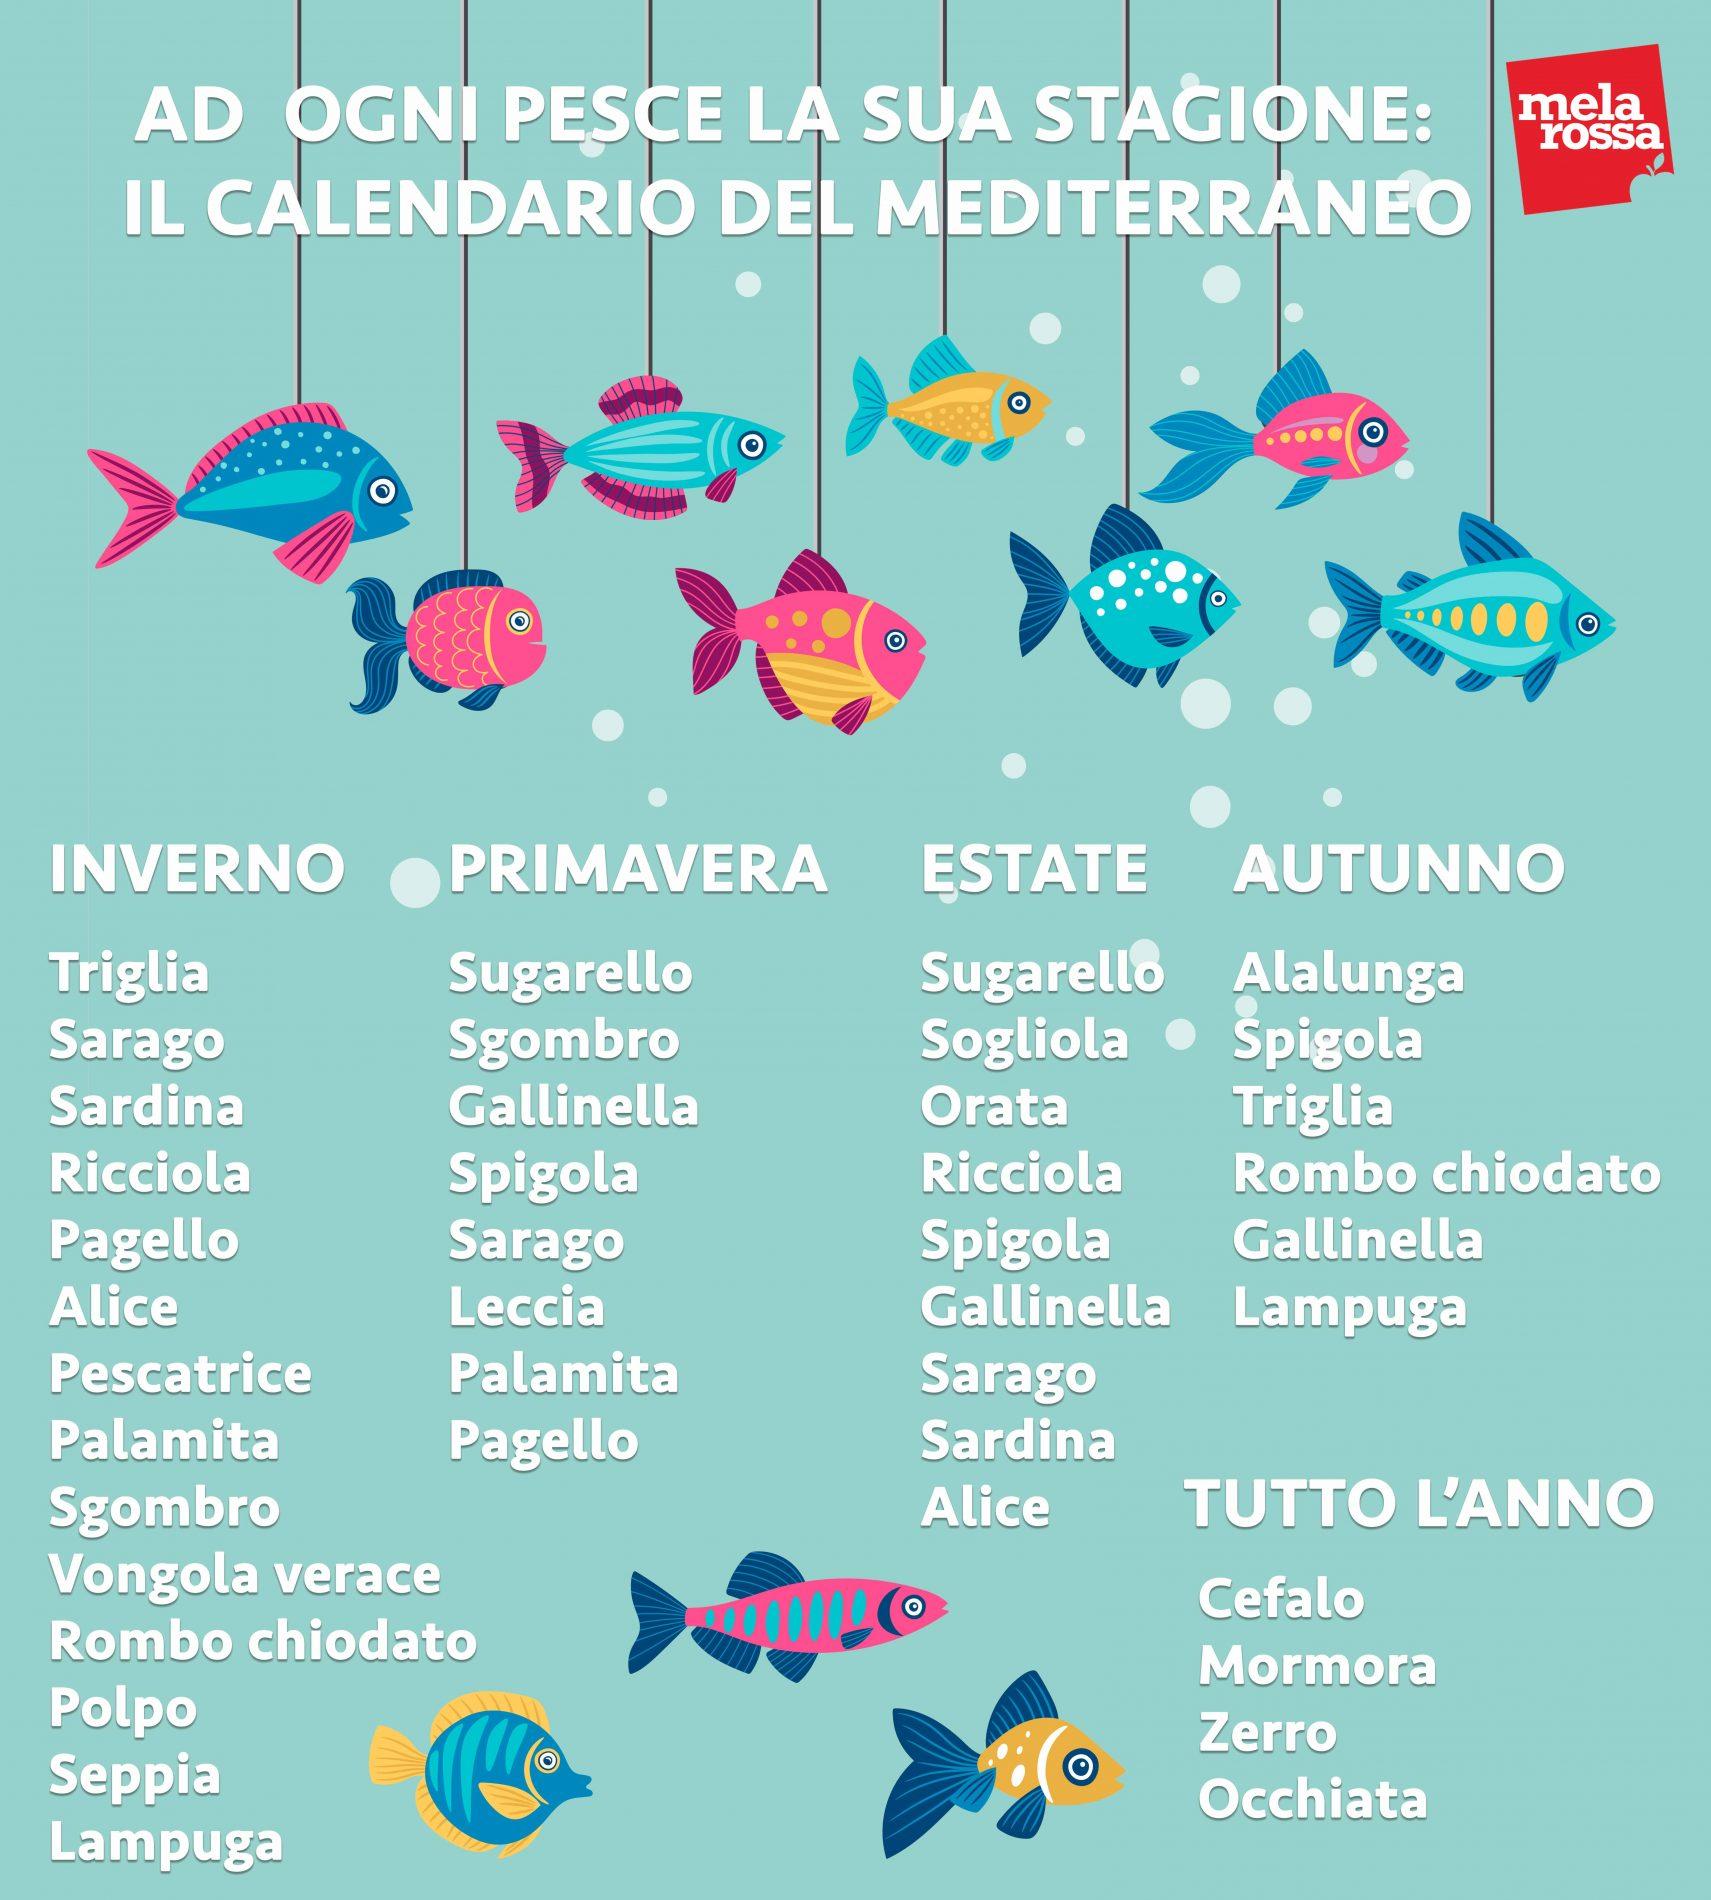 guía de compra de pescado: pescado para comprar